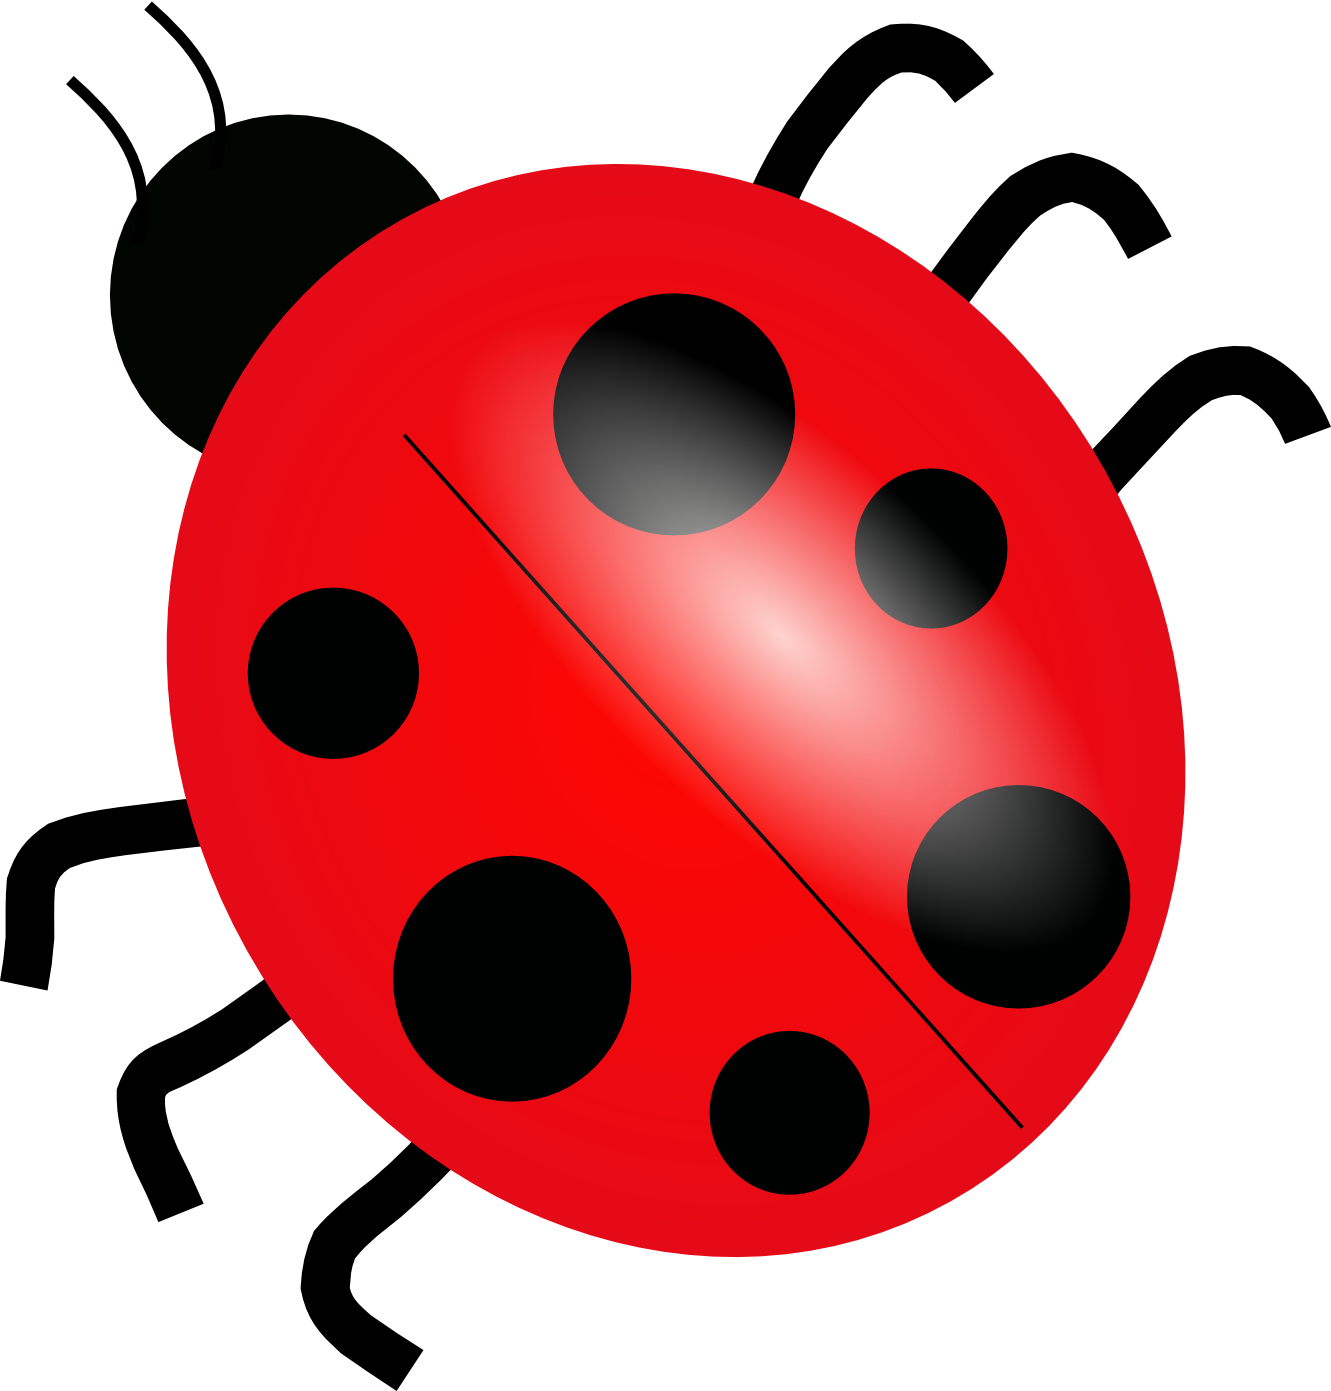 Ladybug HD PNG - 90635